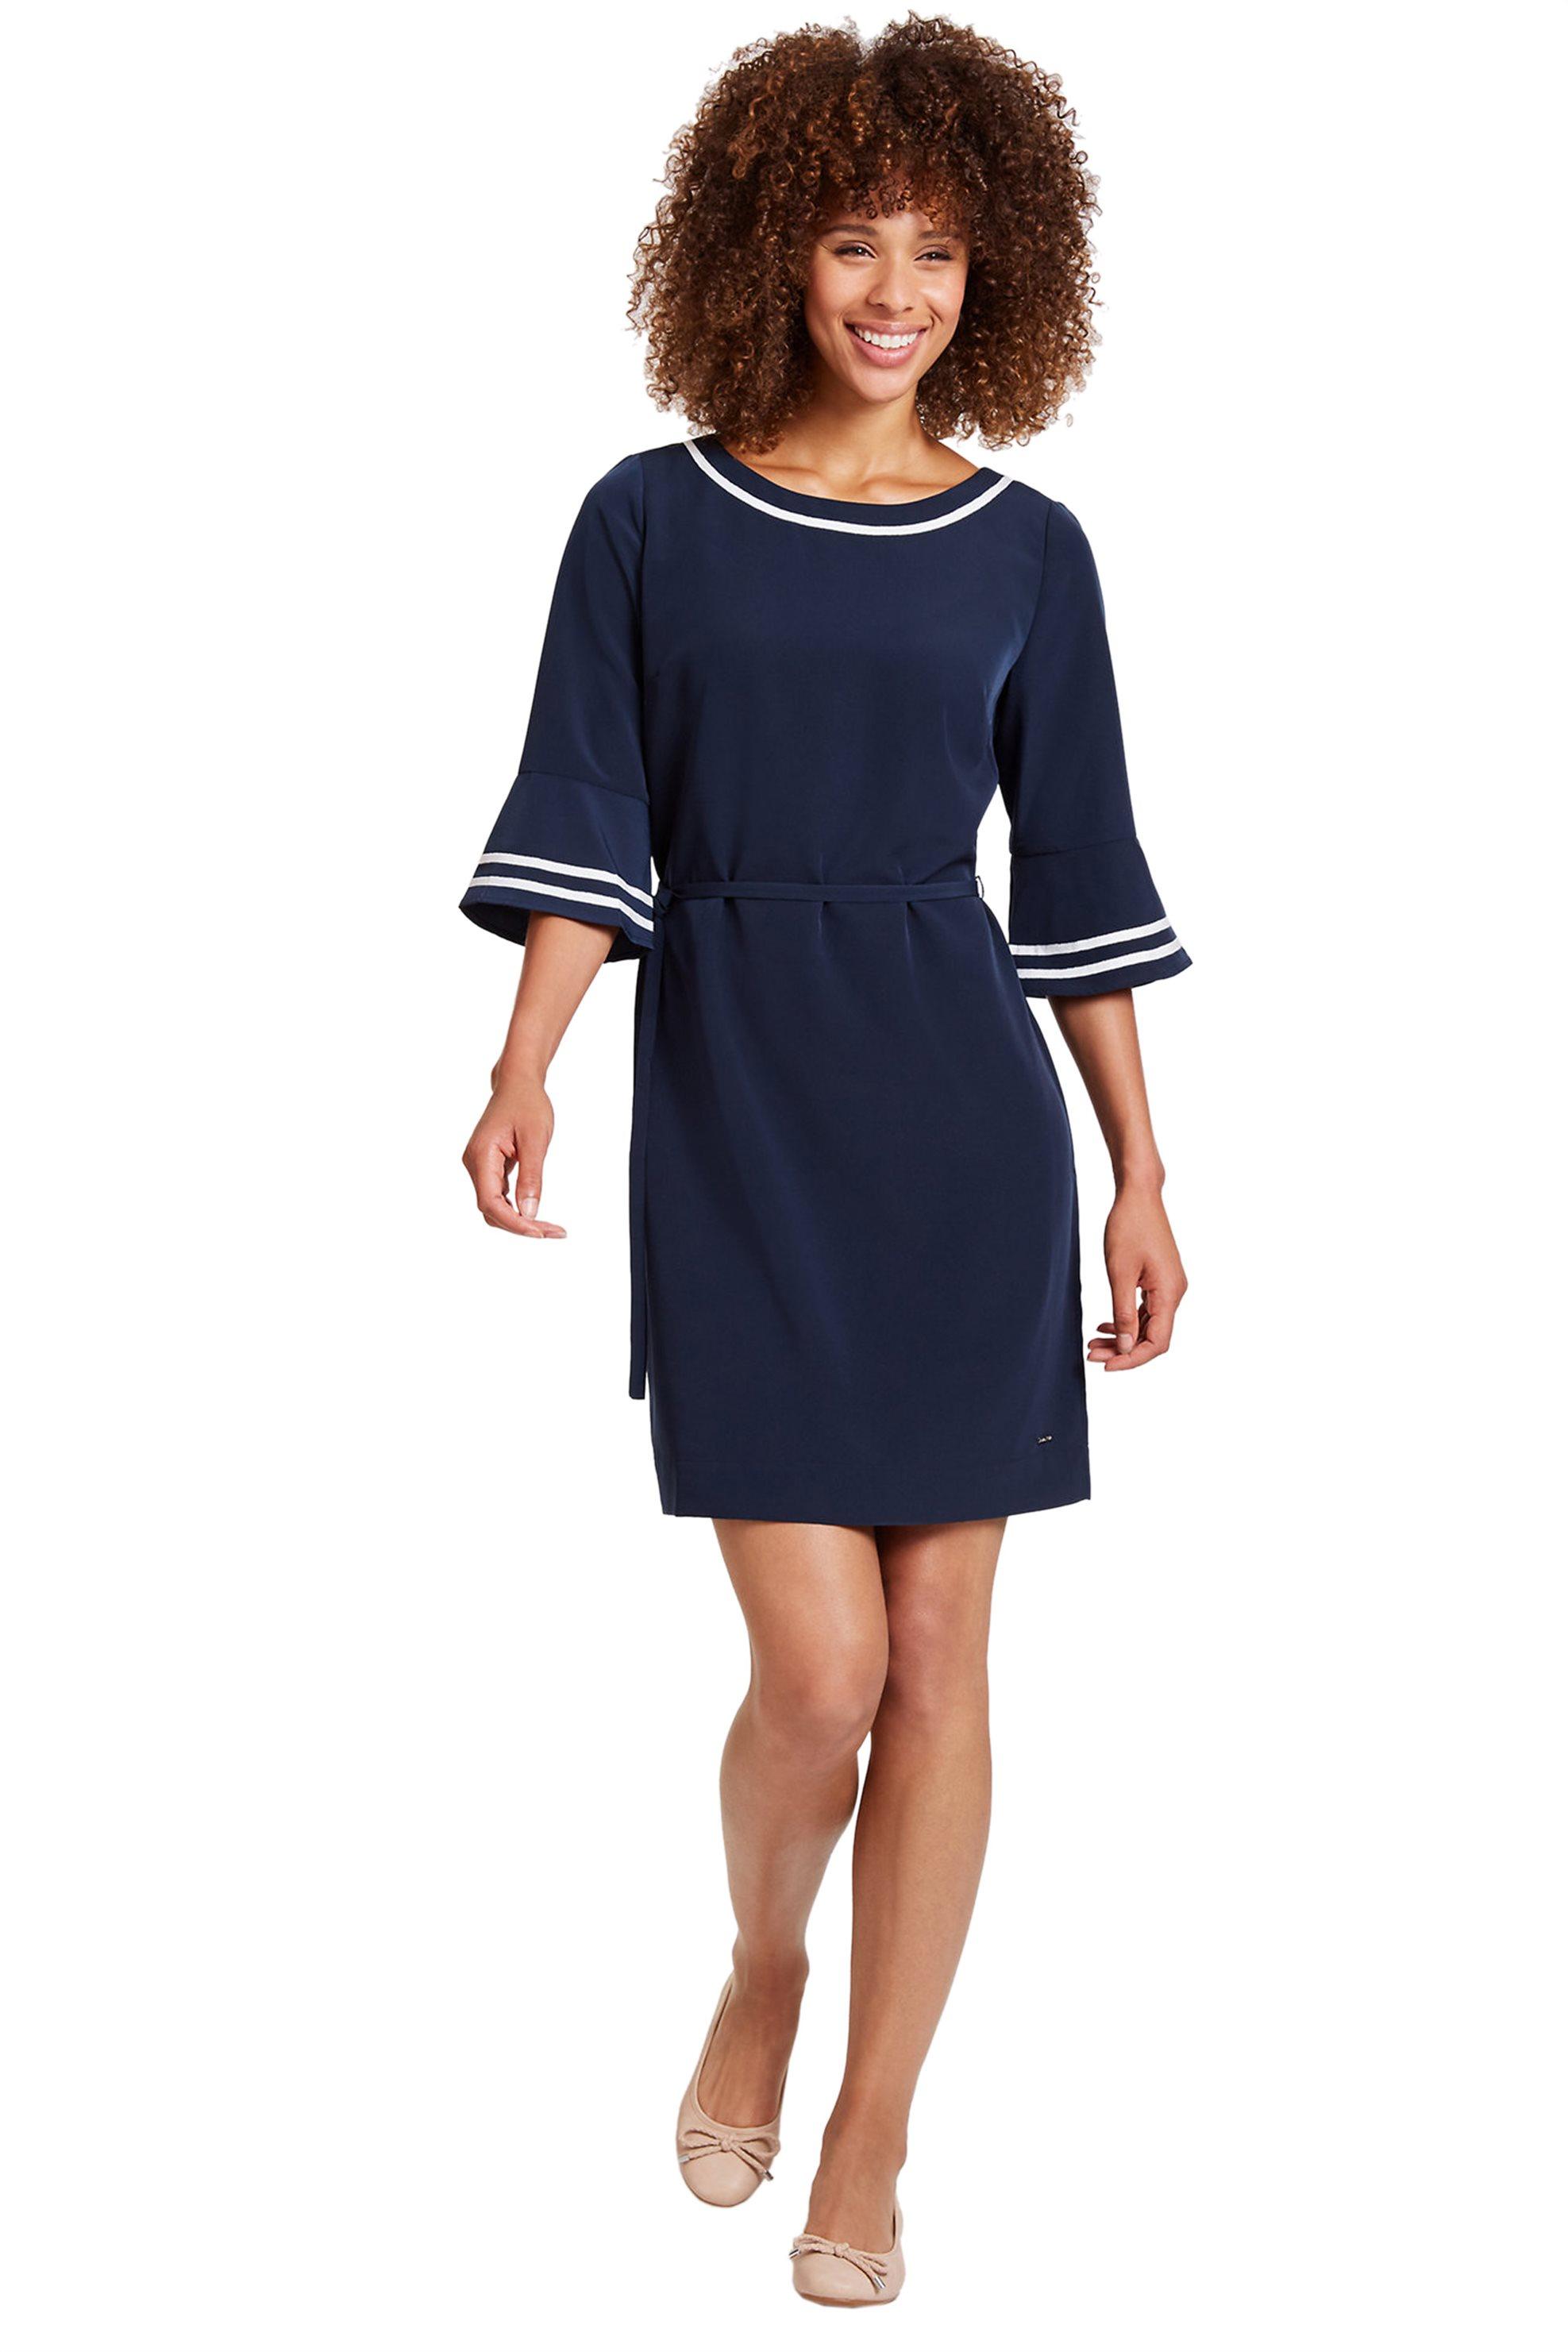 Nautica γυναικείο φόρεμα με μανίκι καμπάνα - 83D208 - Μπλε Σκούρο γυναικα   ρουχα   φορέματα   mini φορέματα